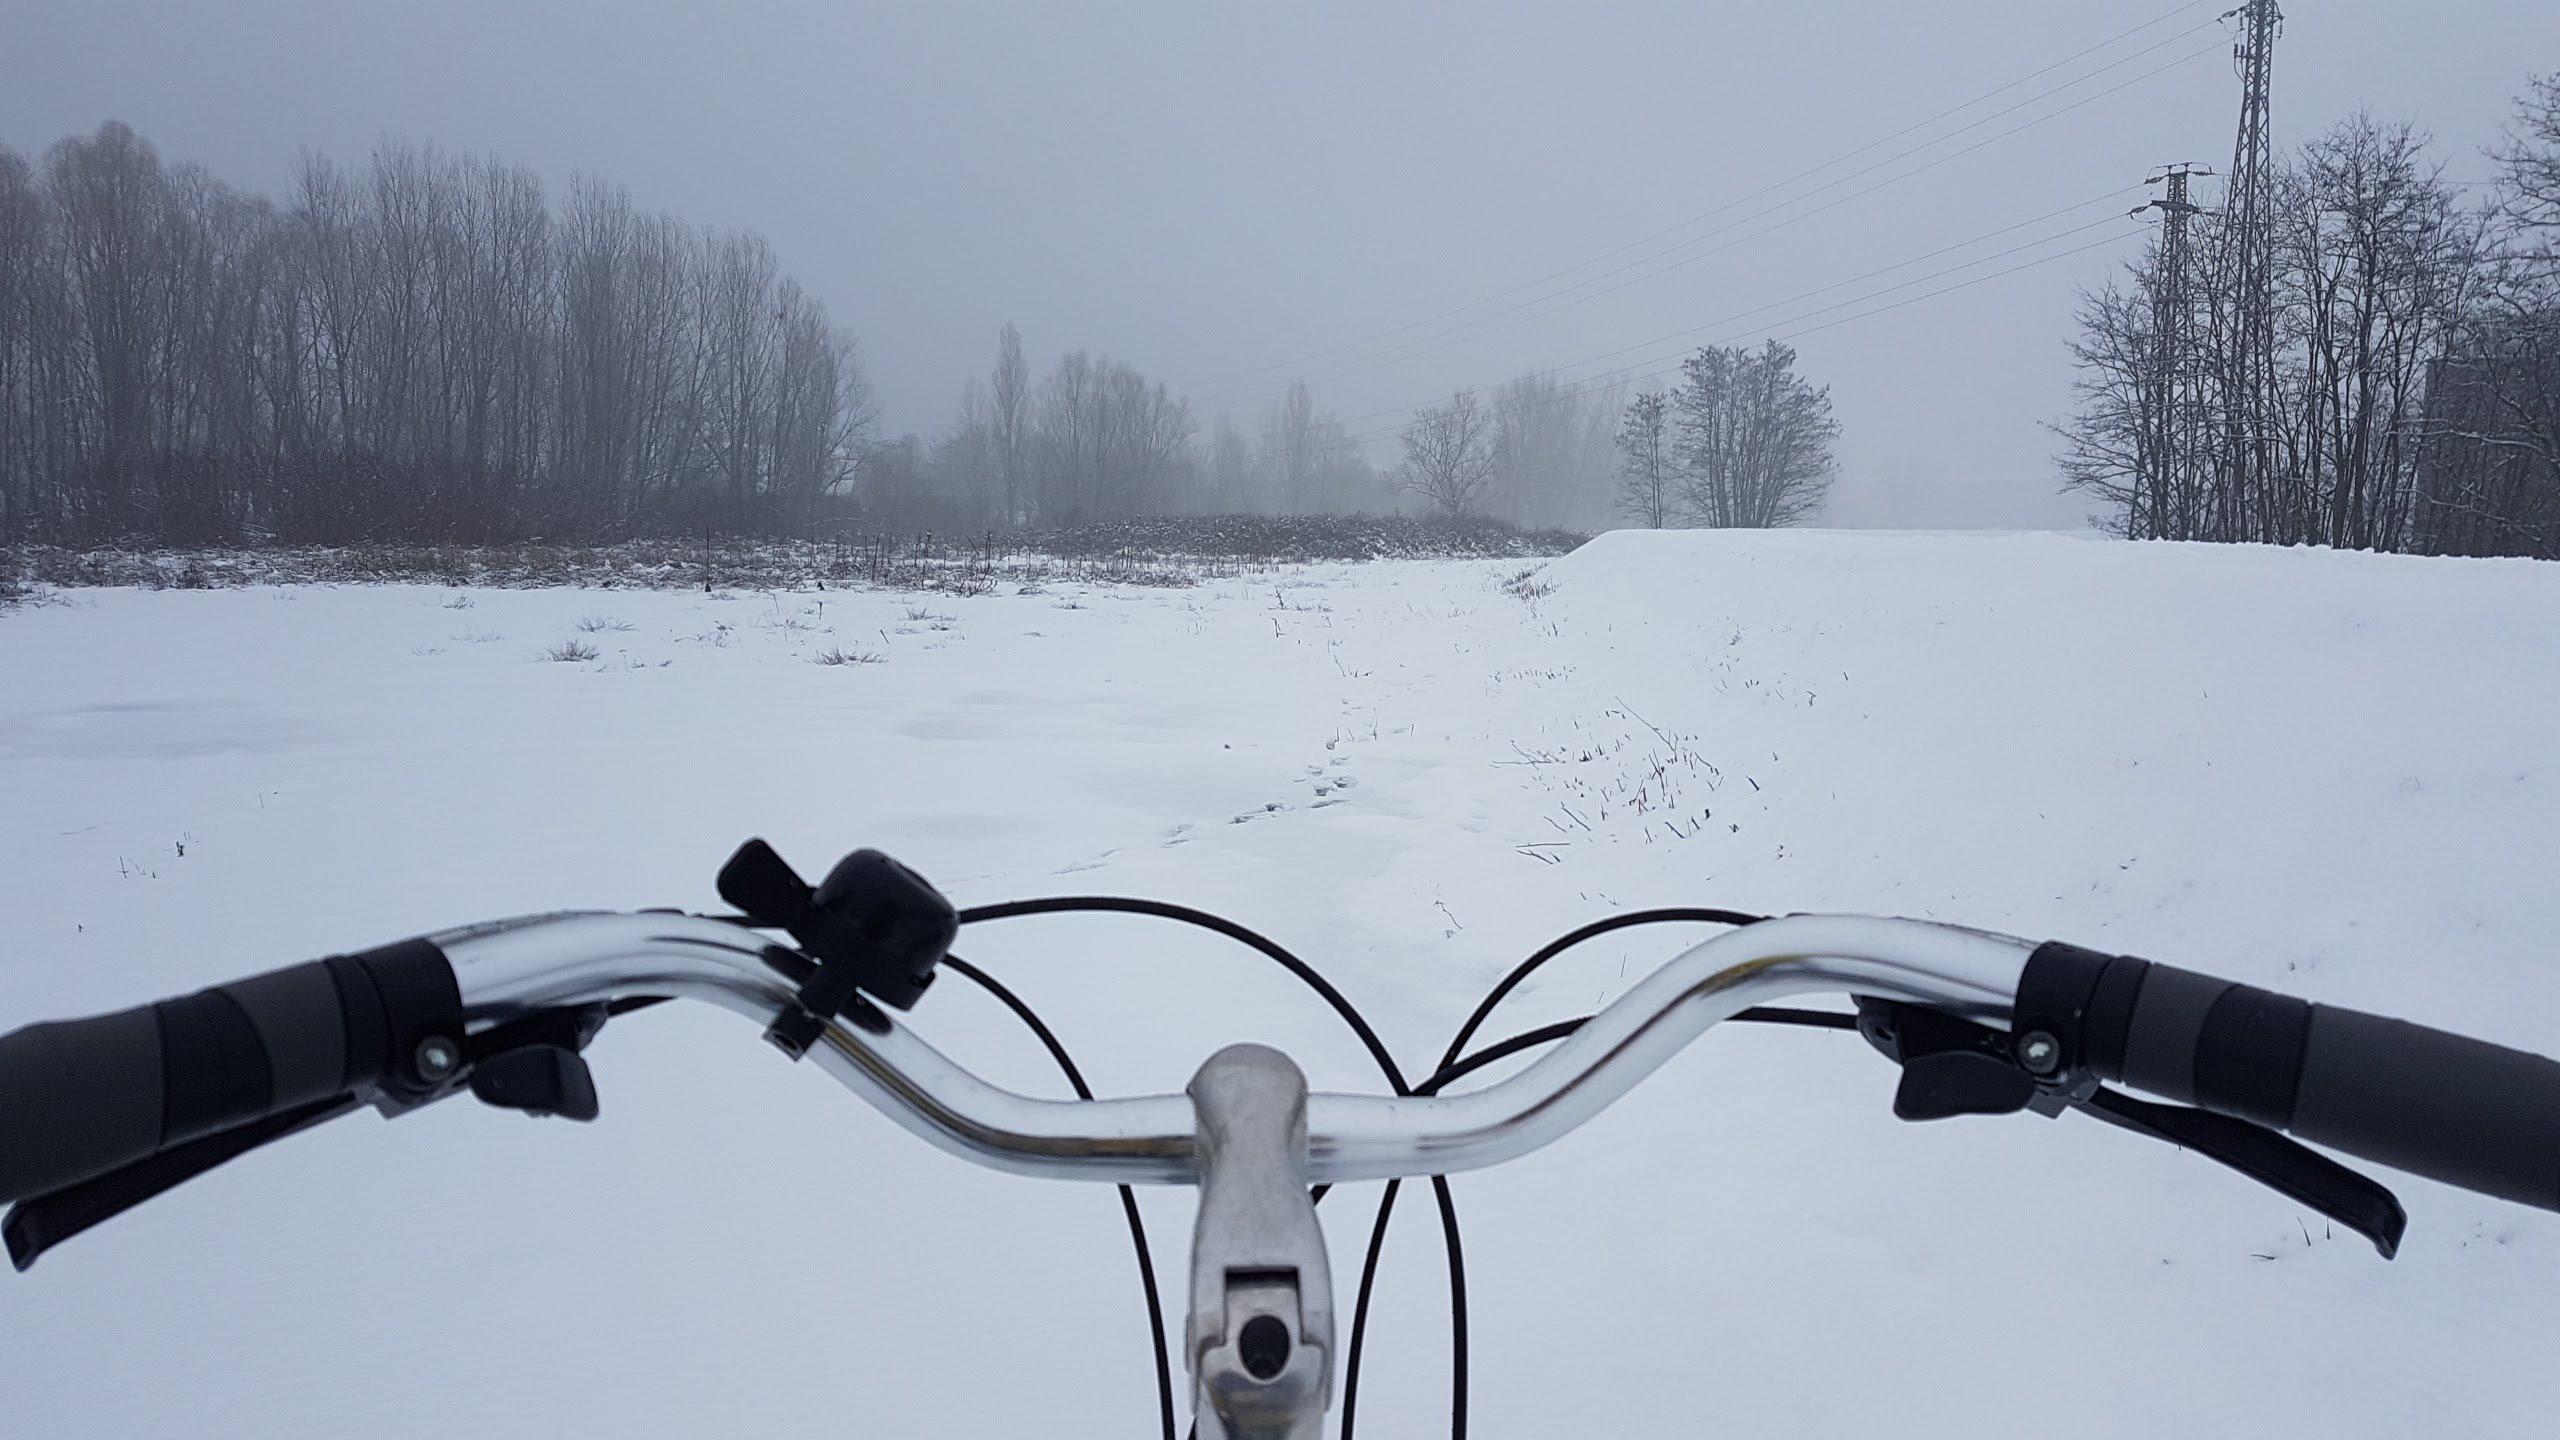 Ode al pedalar sotto la neve